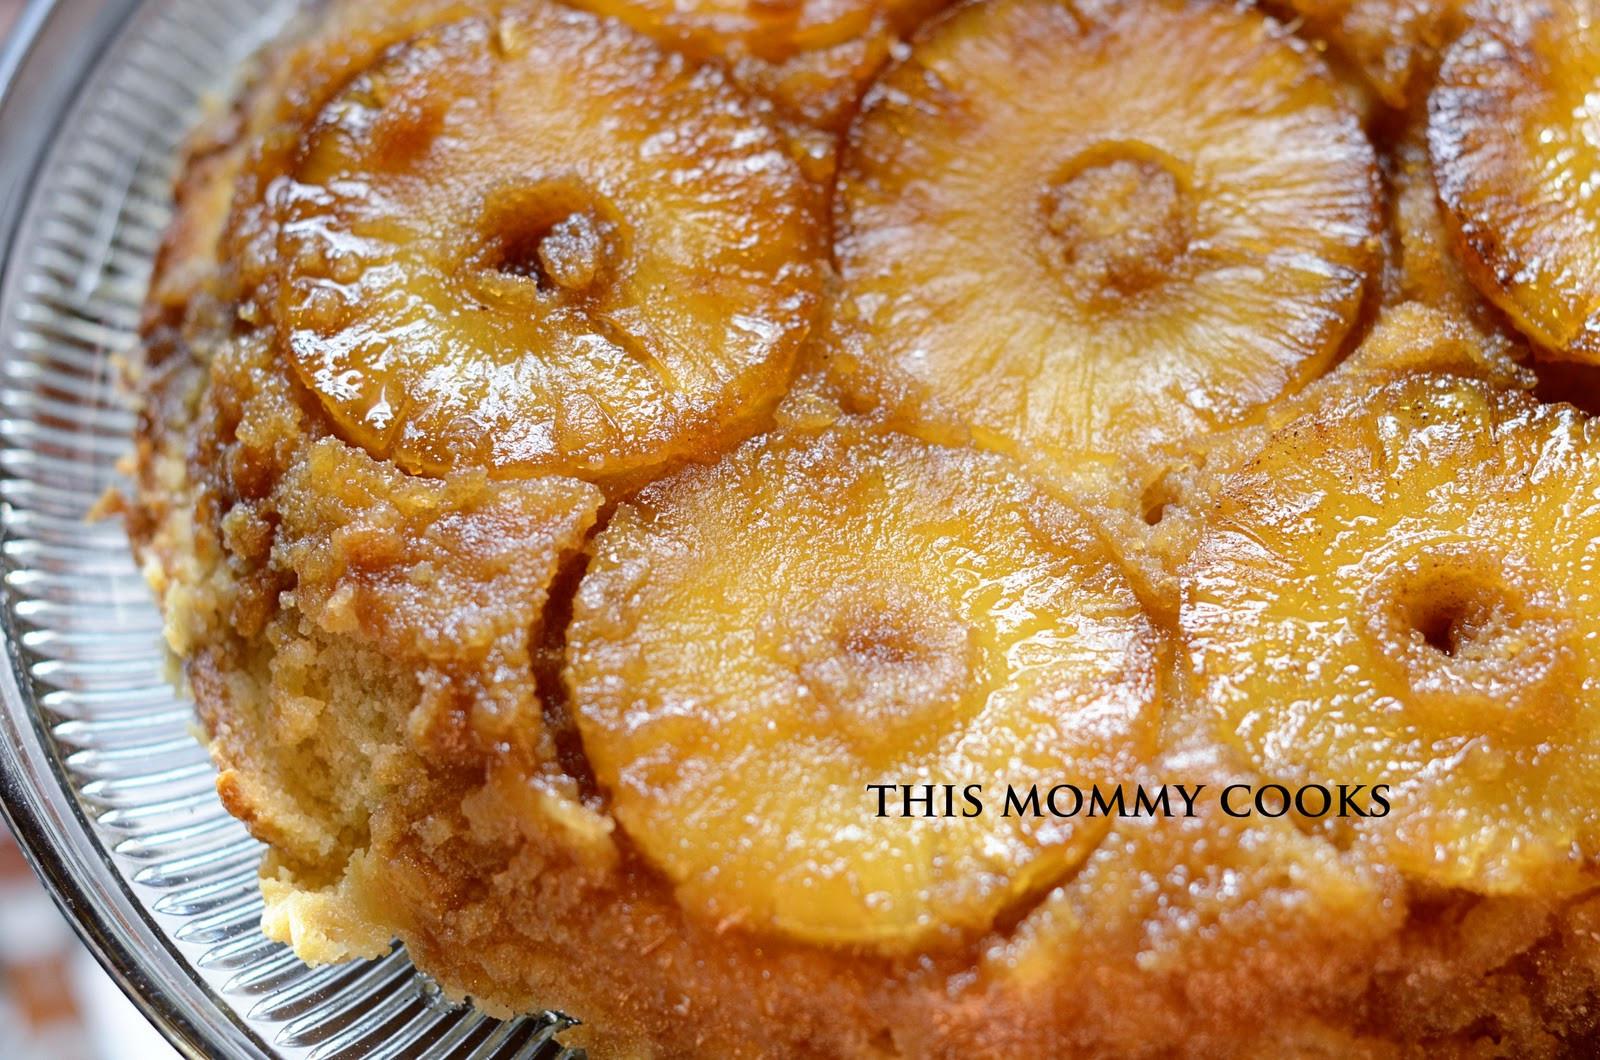 Cast Iron Skillet Pineapple Upside Down Cake  This Mommy Cooks Pineapple Upside Down Cake in cast iron